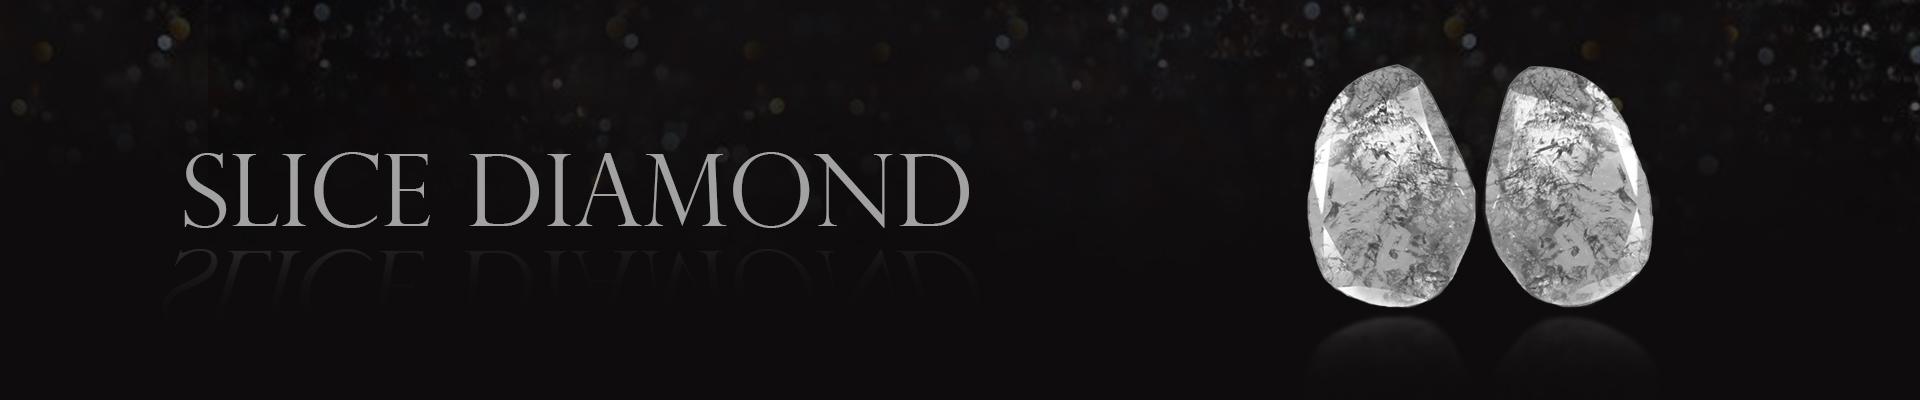 SLICE DIAMOND